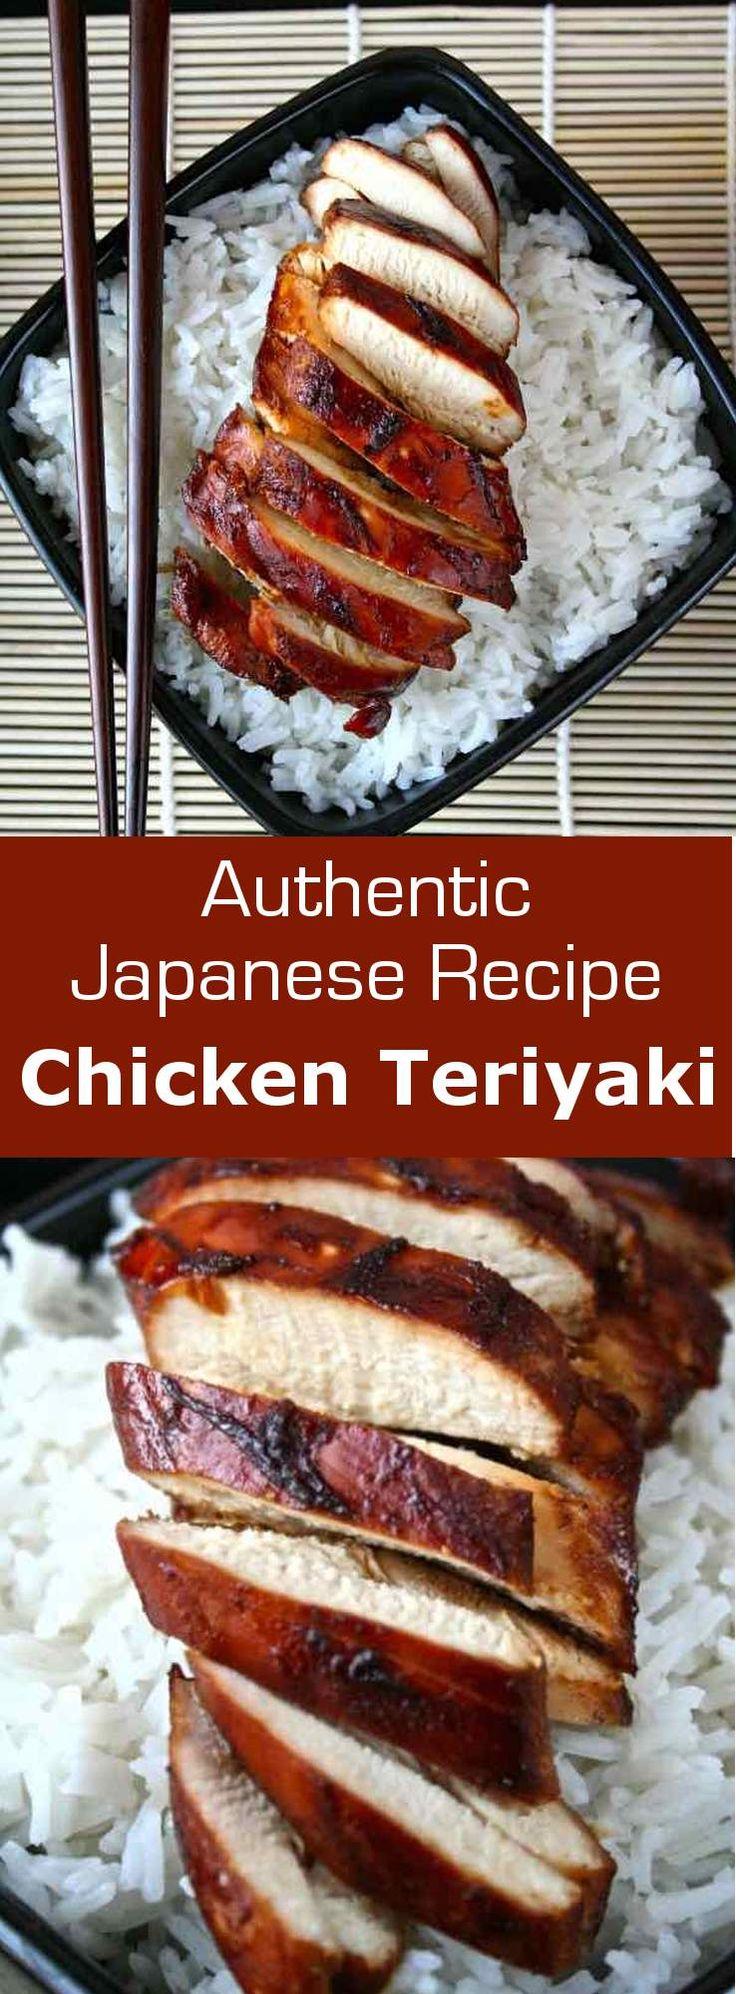 Chicken teriyaki consists in marinating and cooking chicken in teriyaki sauce…